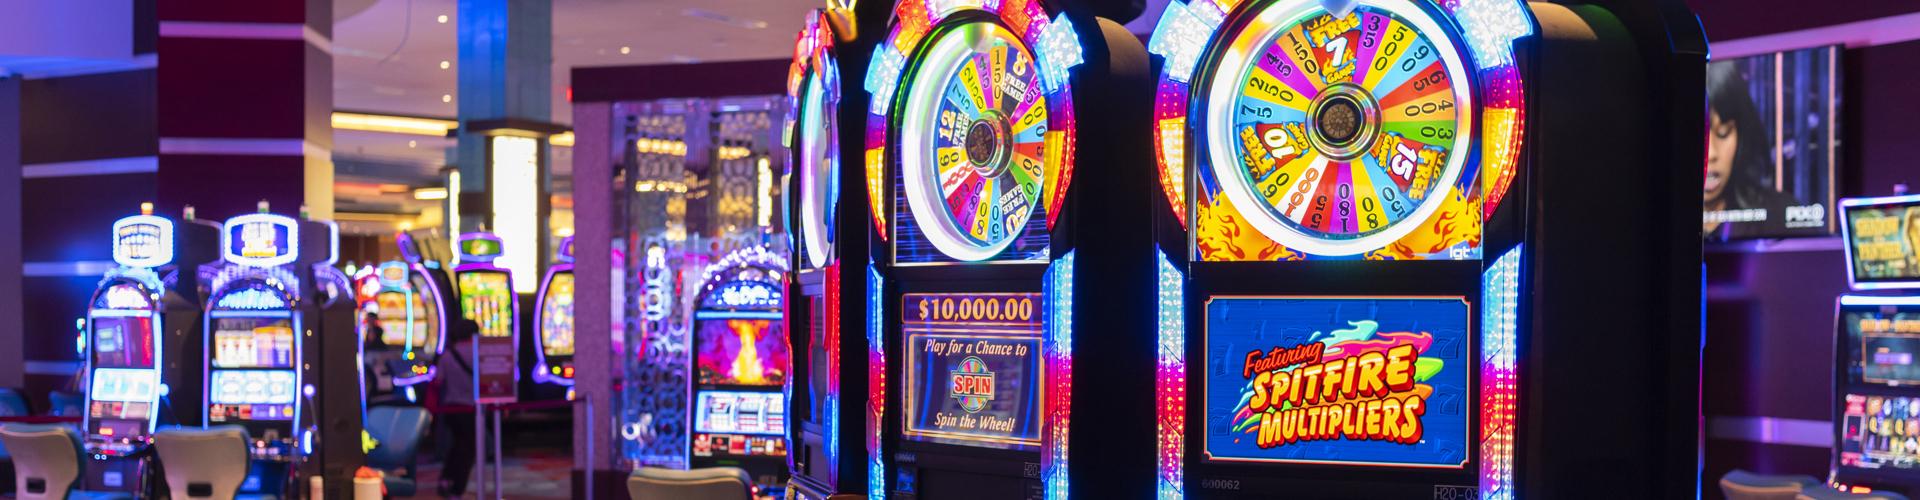 Resorts World Catskills Slots